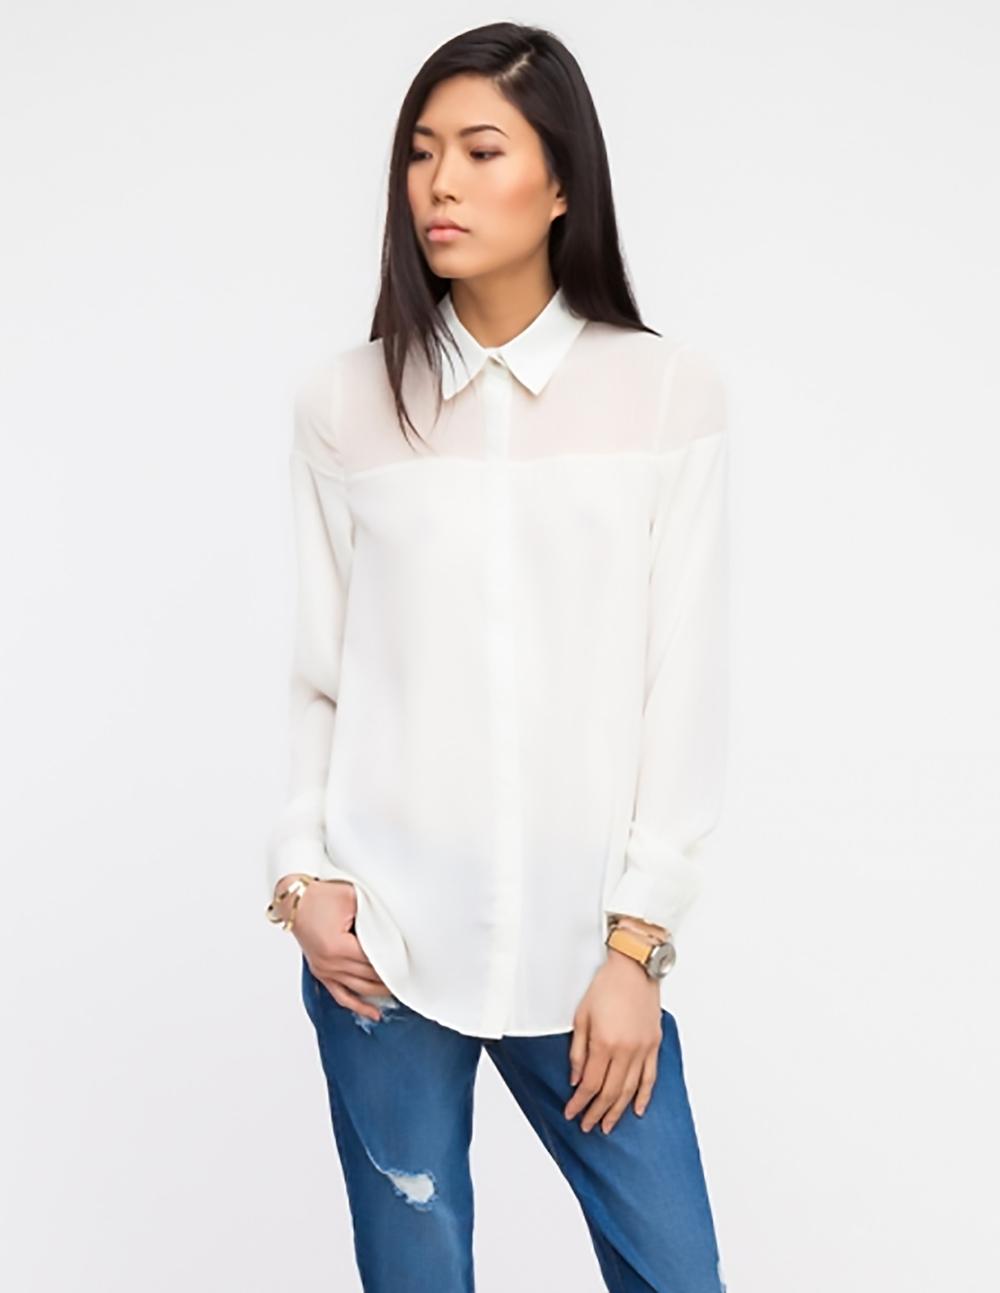 need supply delta shirt see thru shoulders 1500.jpg